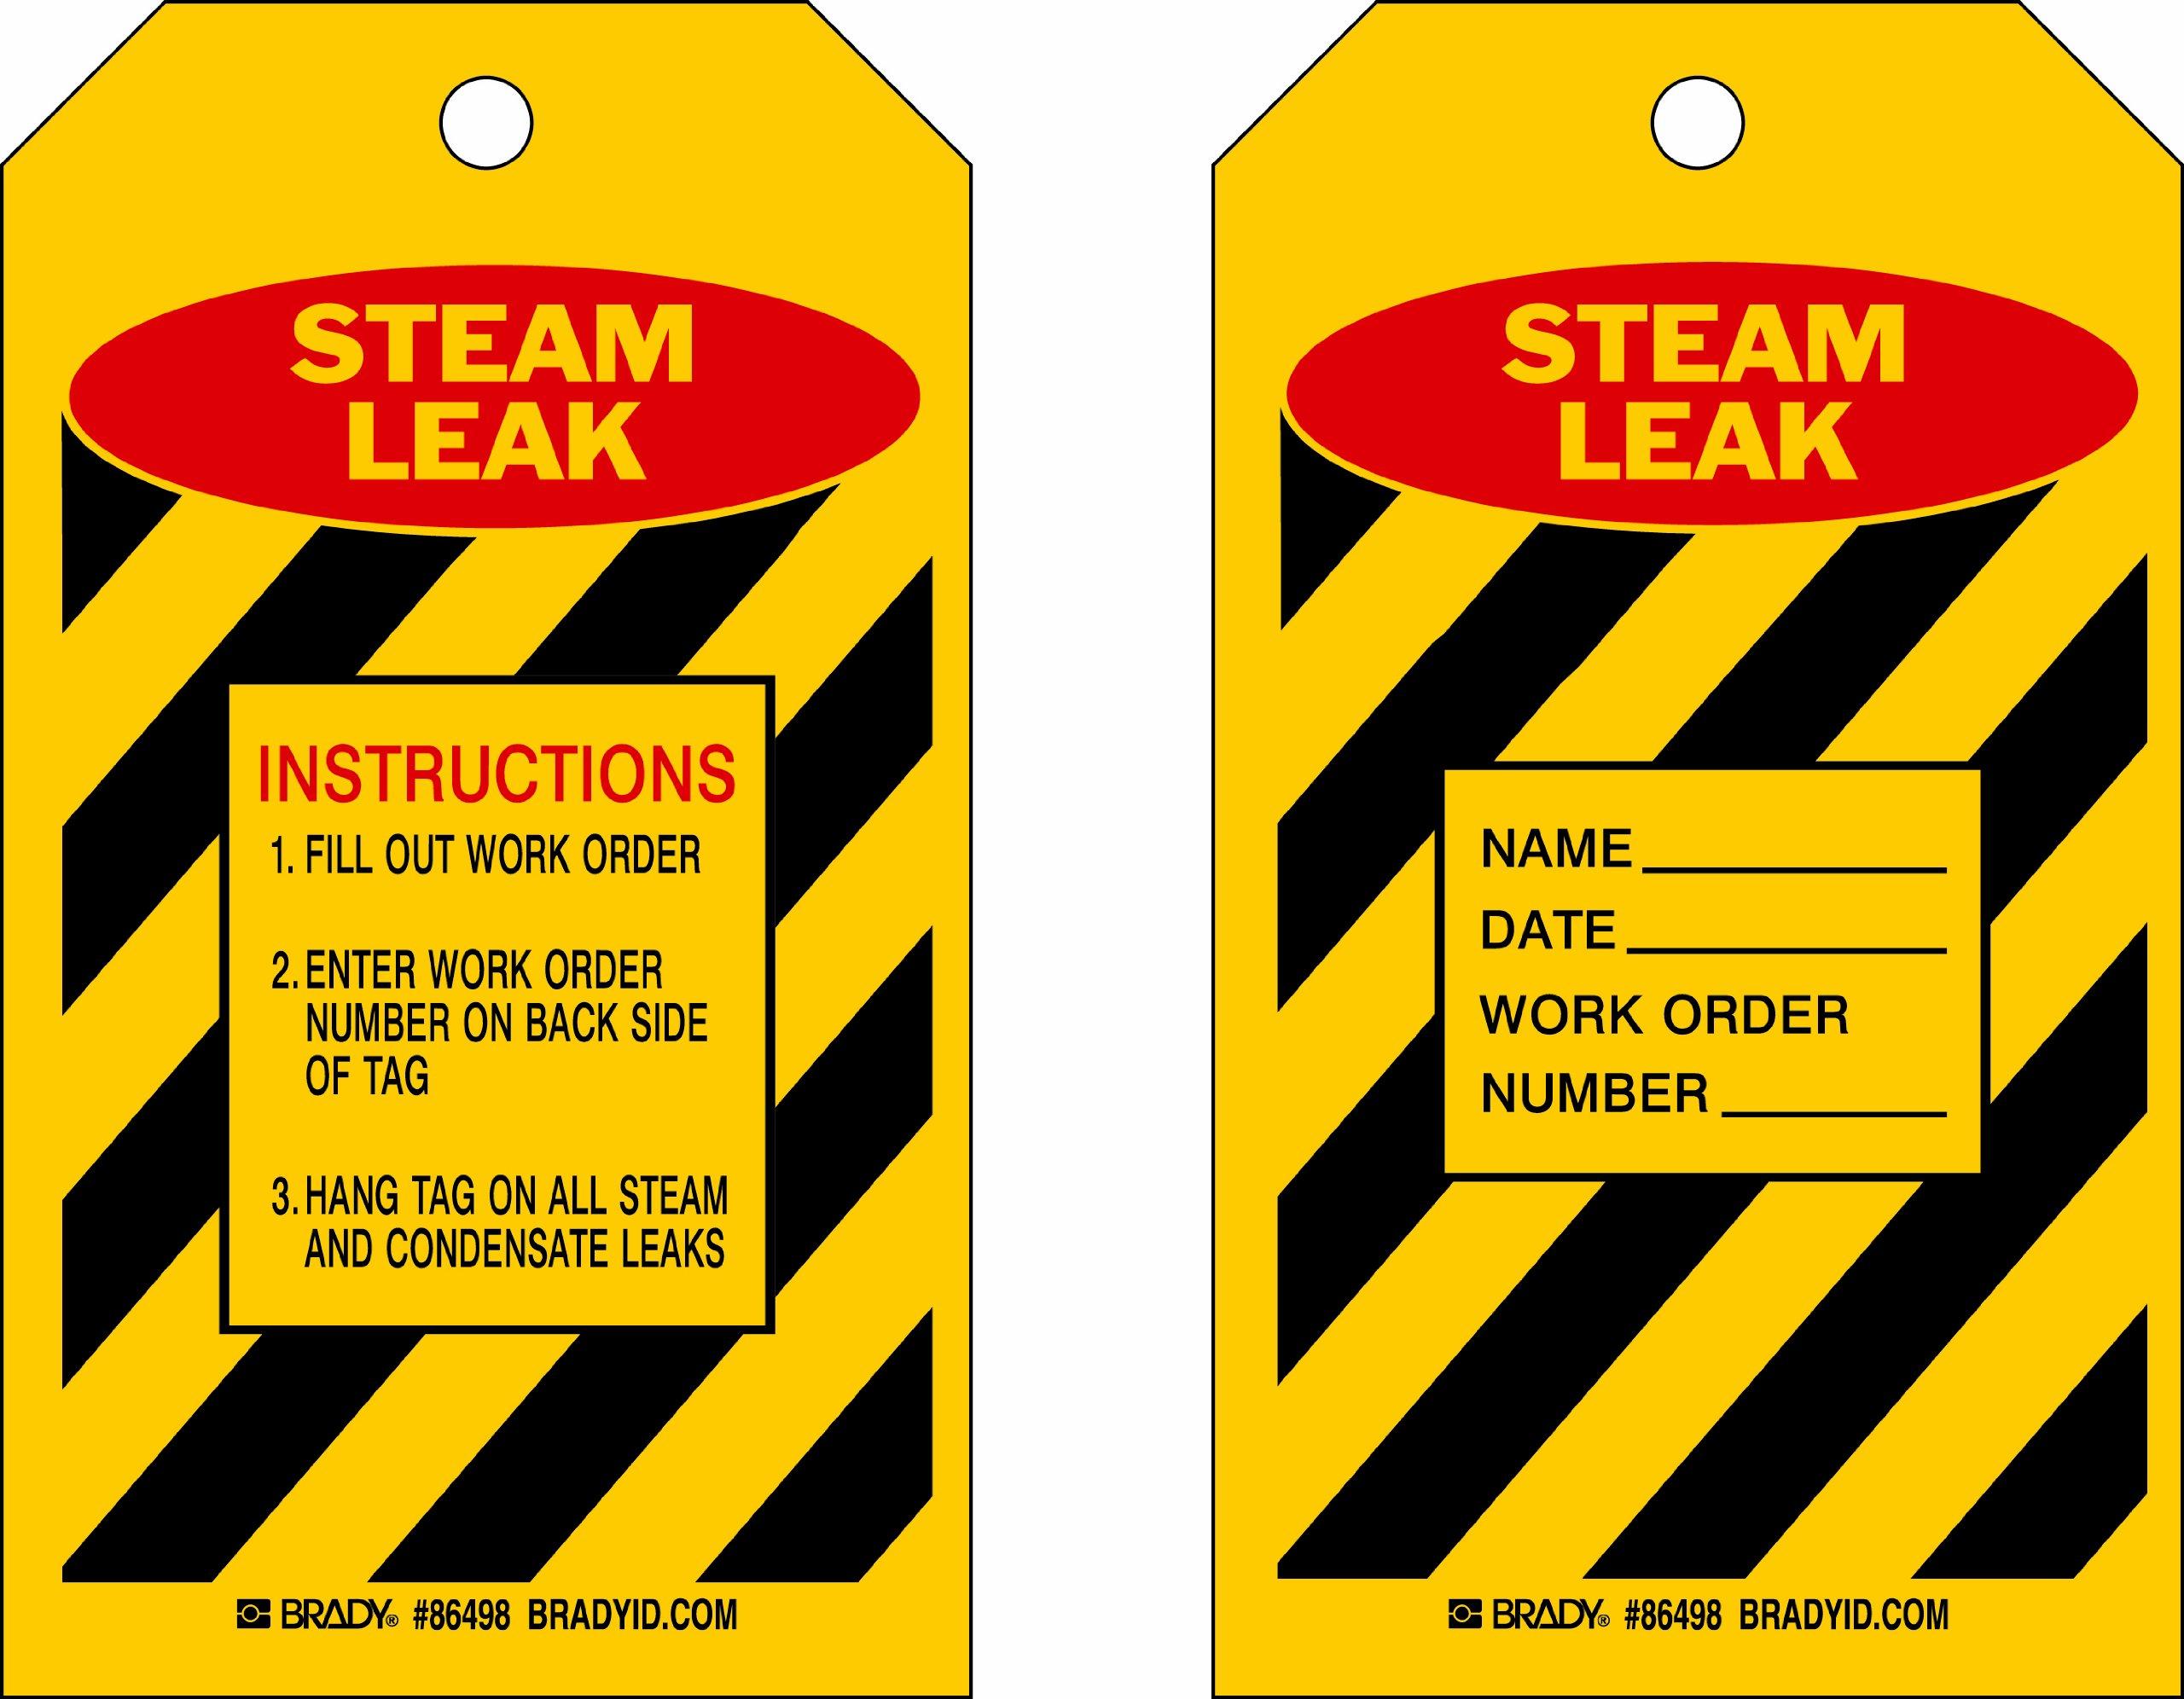 Brady  86498 7'' Height x 4'' Width, Heavy Duty Polyester (B-837), Red/Black on Yellow Steam Leak Tags (10 Tags) by Brady